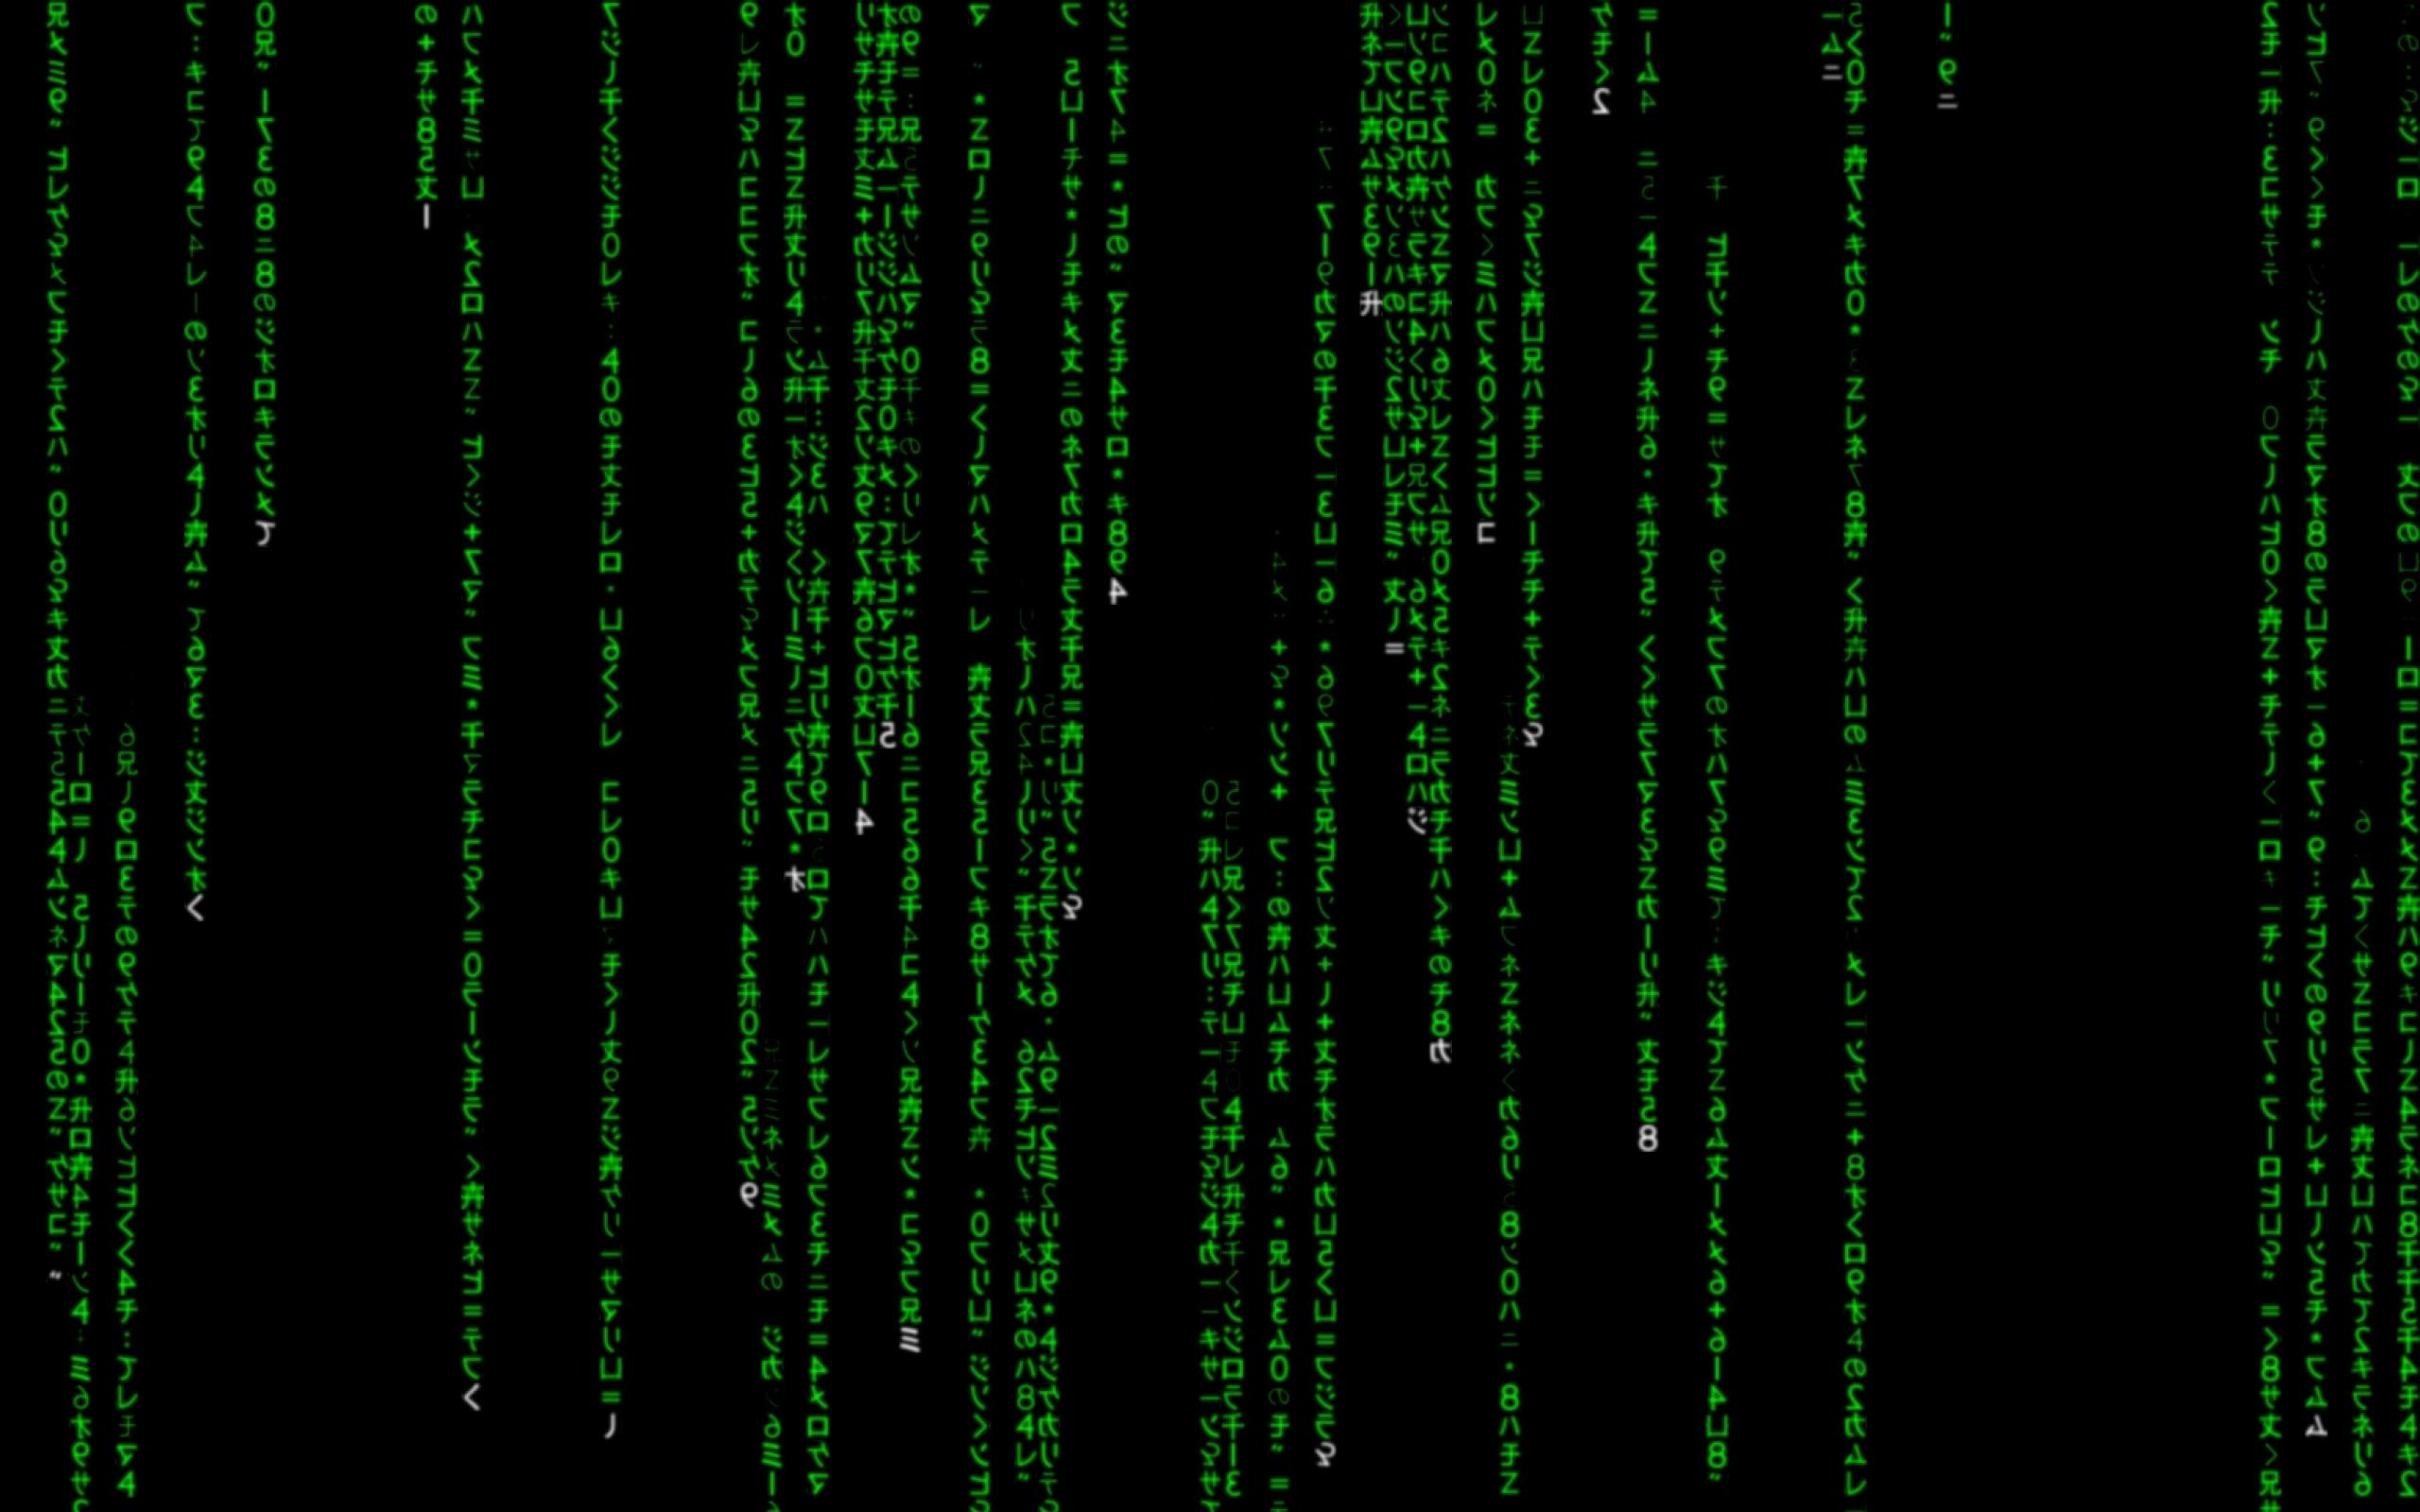 matrix code kanji 1680x1050 wallpaper Miscellaneous HD Wallpaper 2560x1600